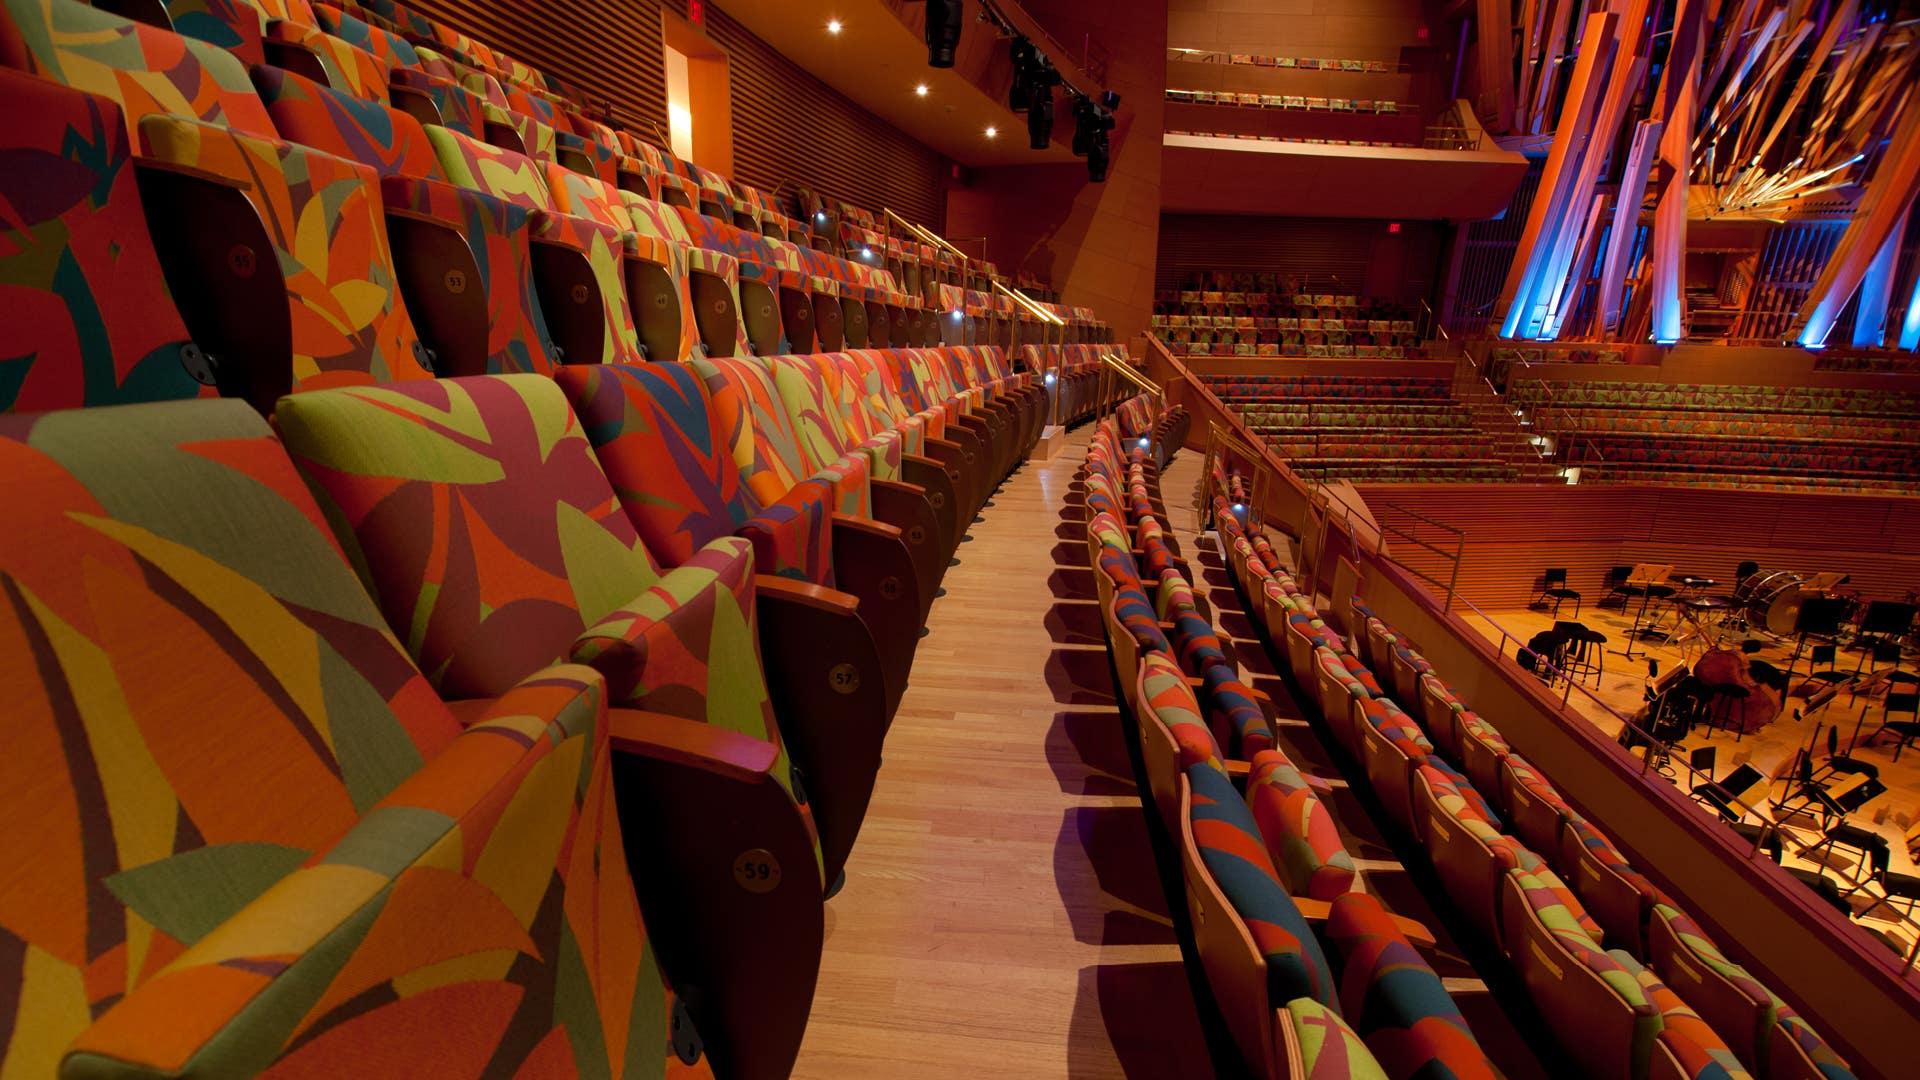 Seating at Walt Disney Concert Hall